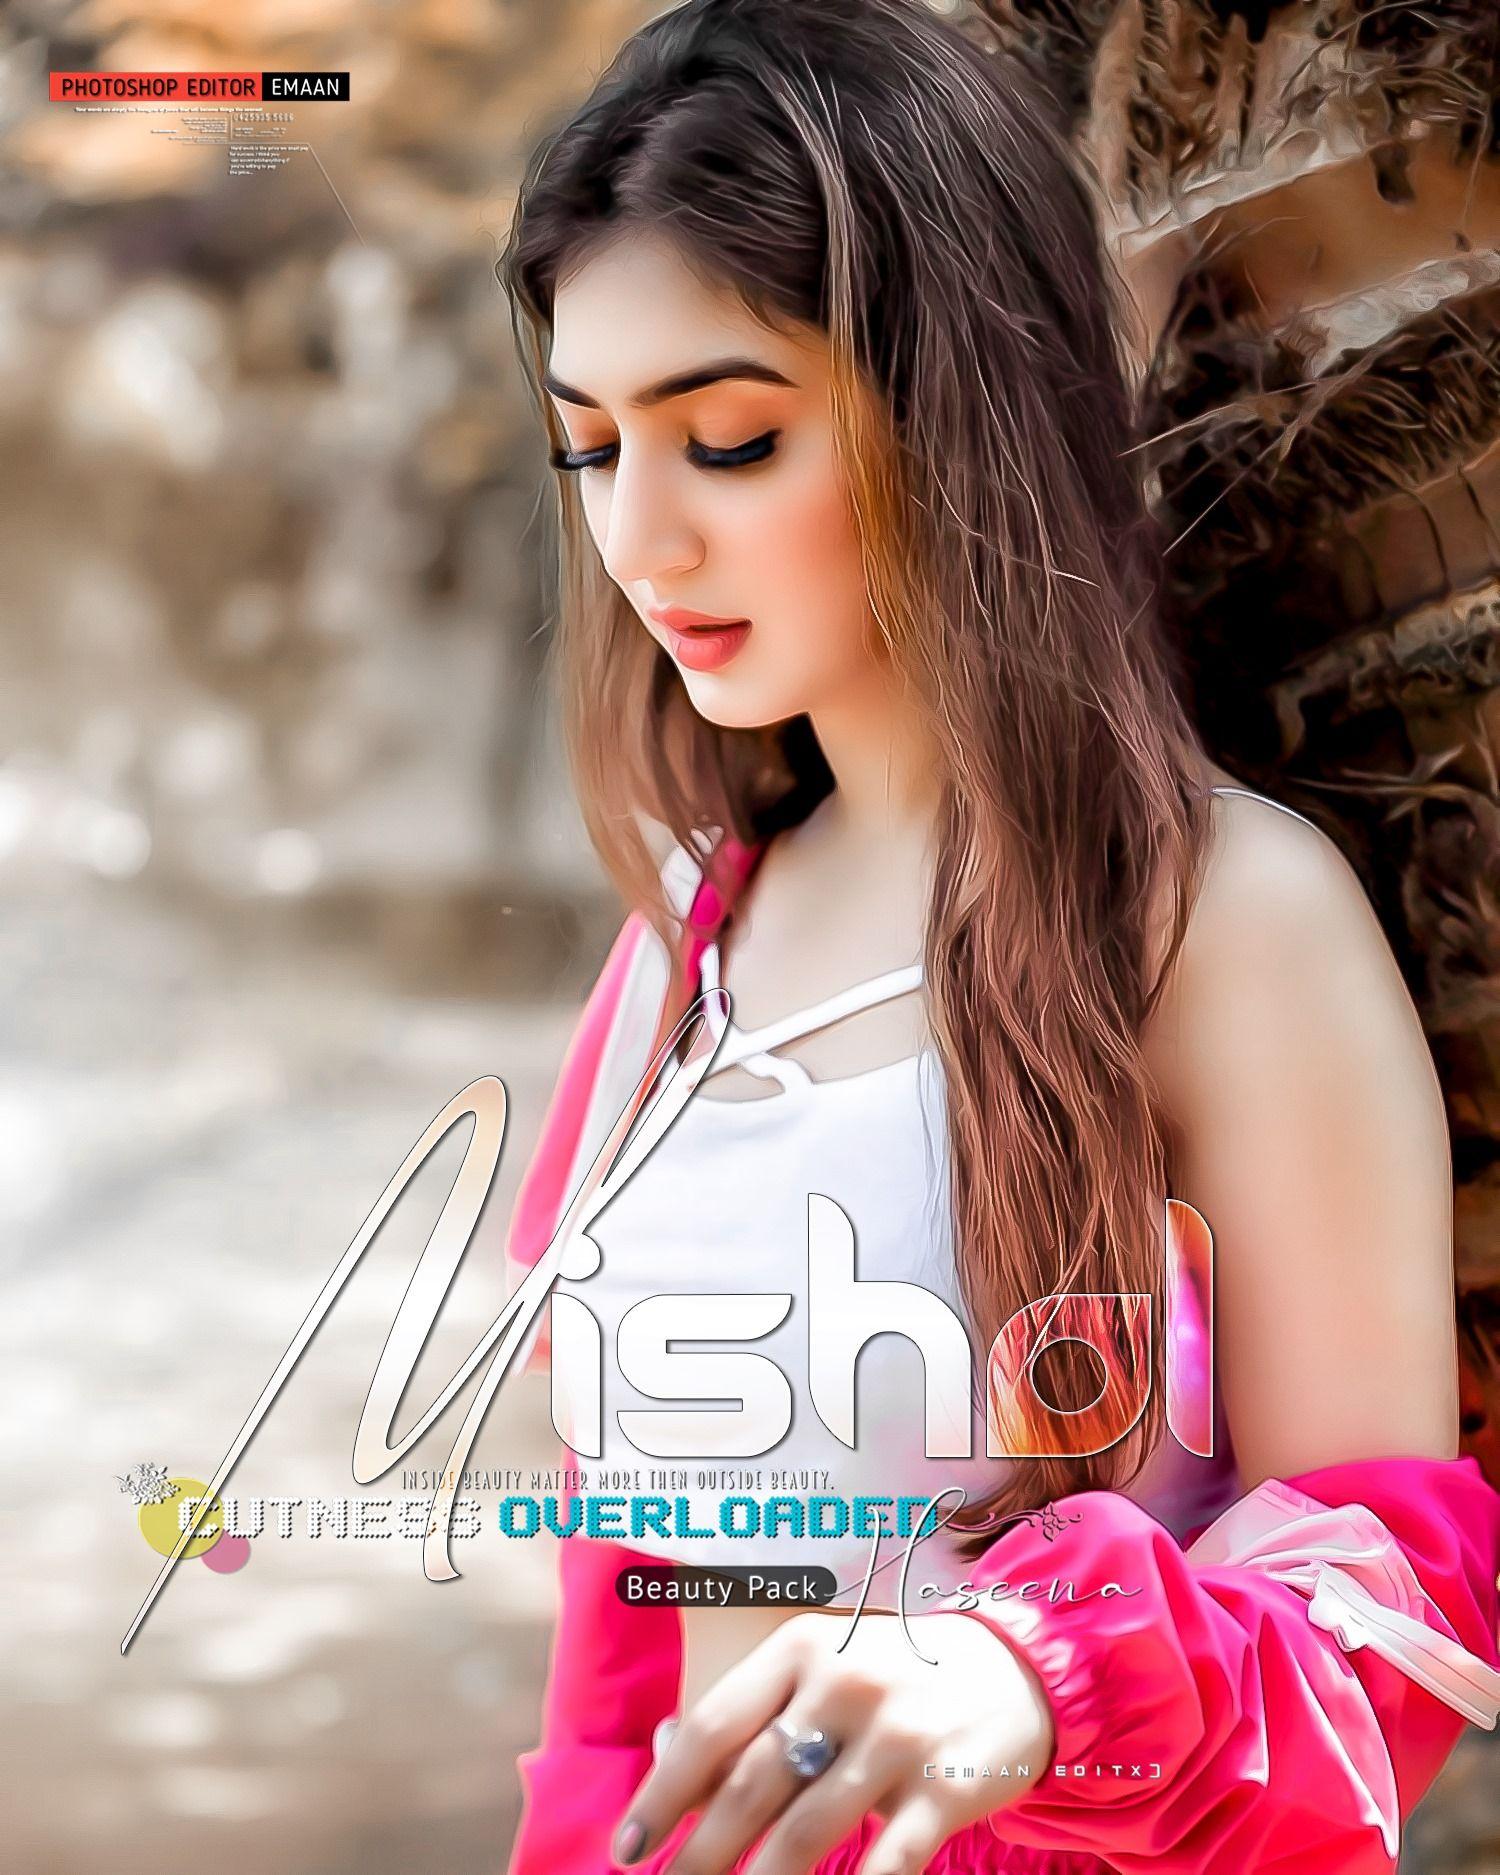 Hot girl wallpaper full hd